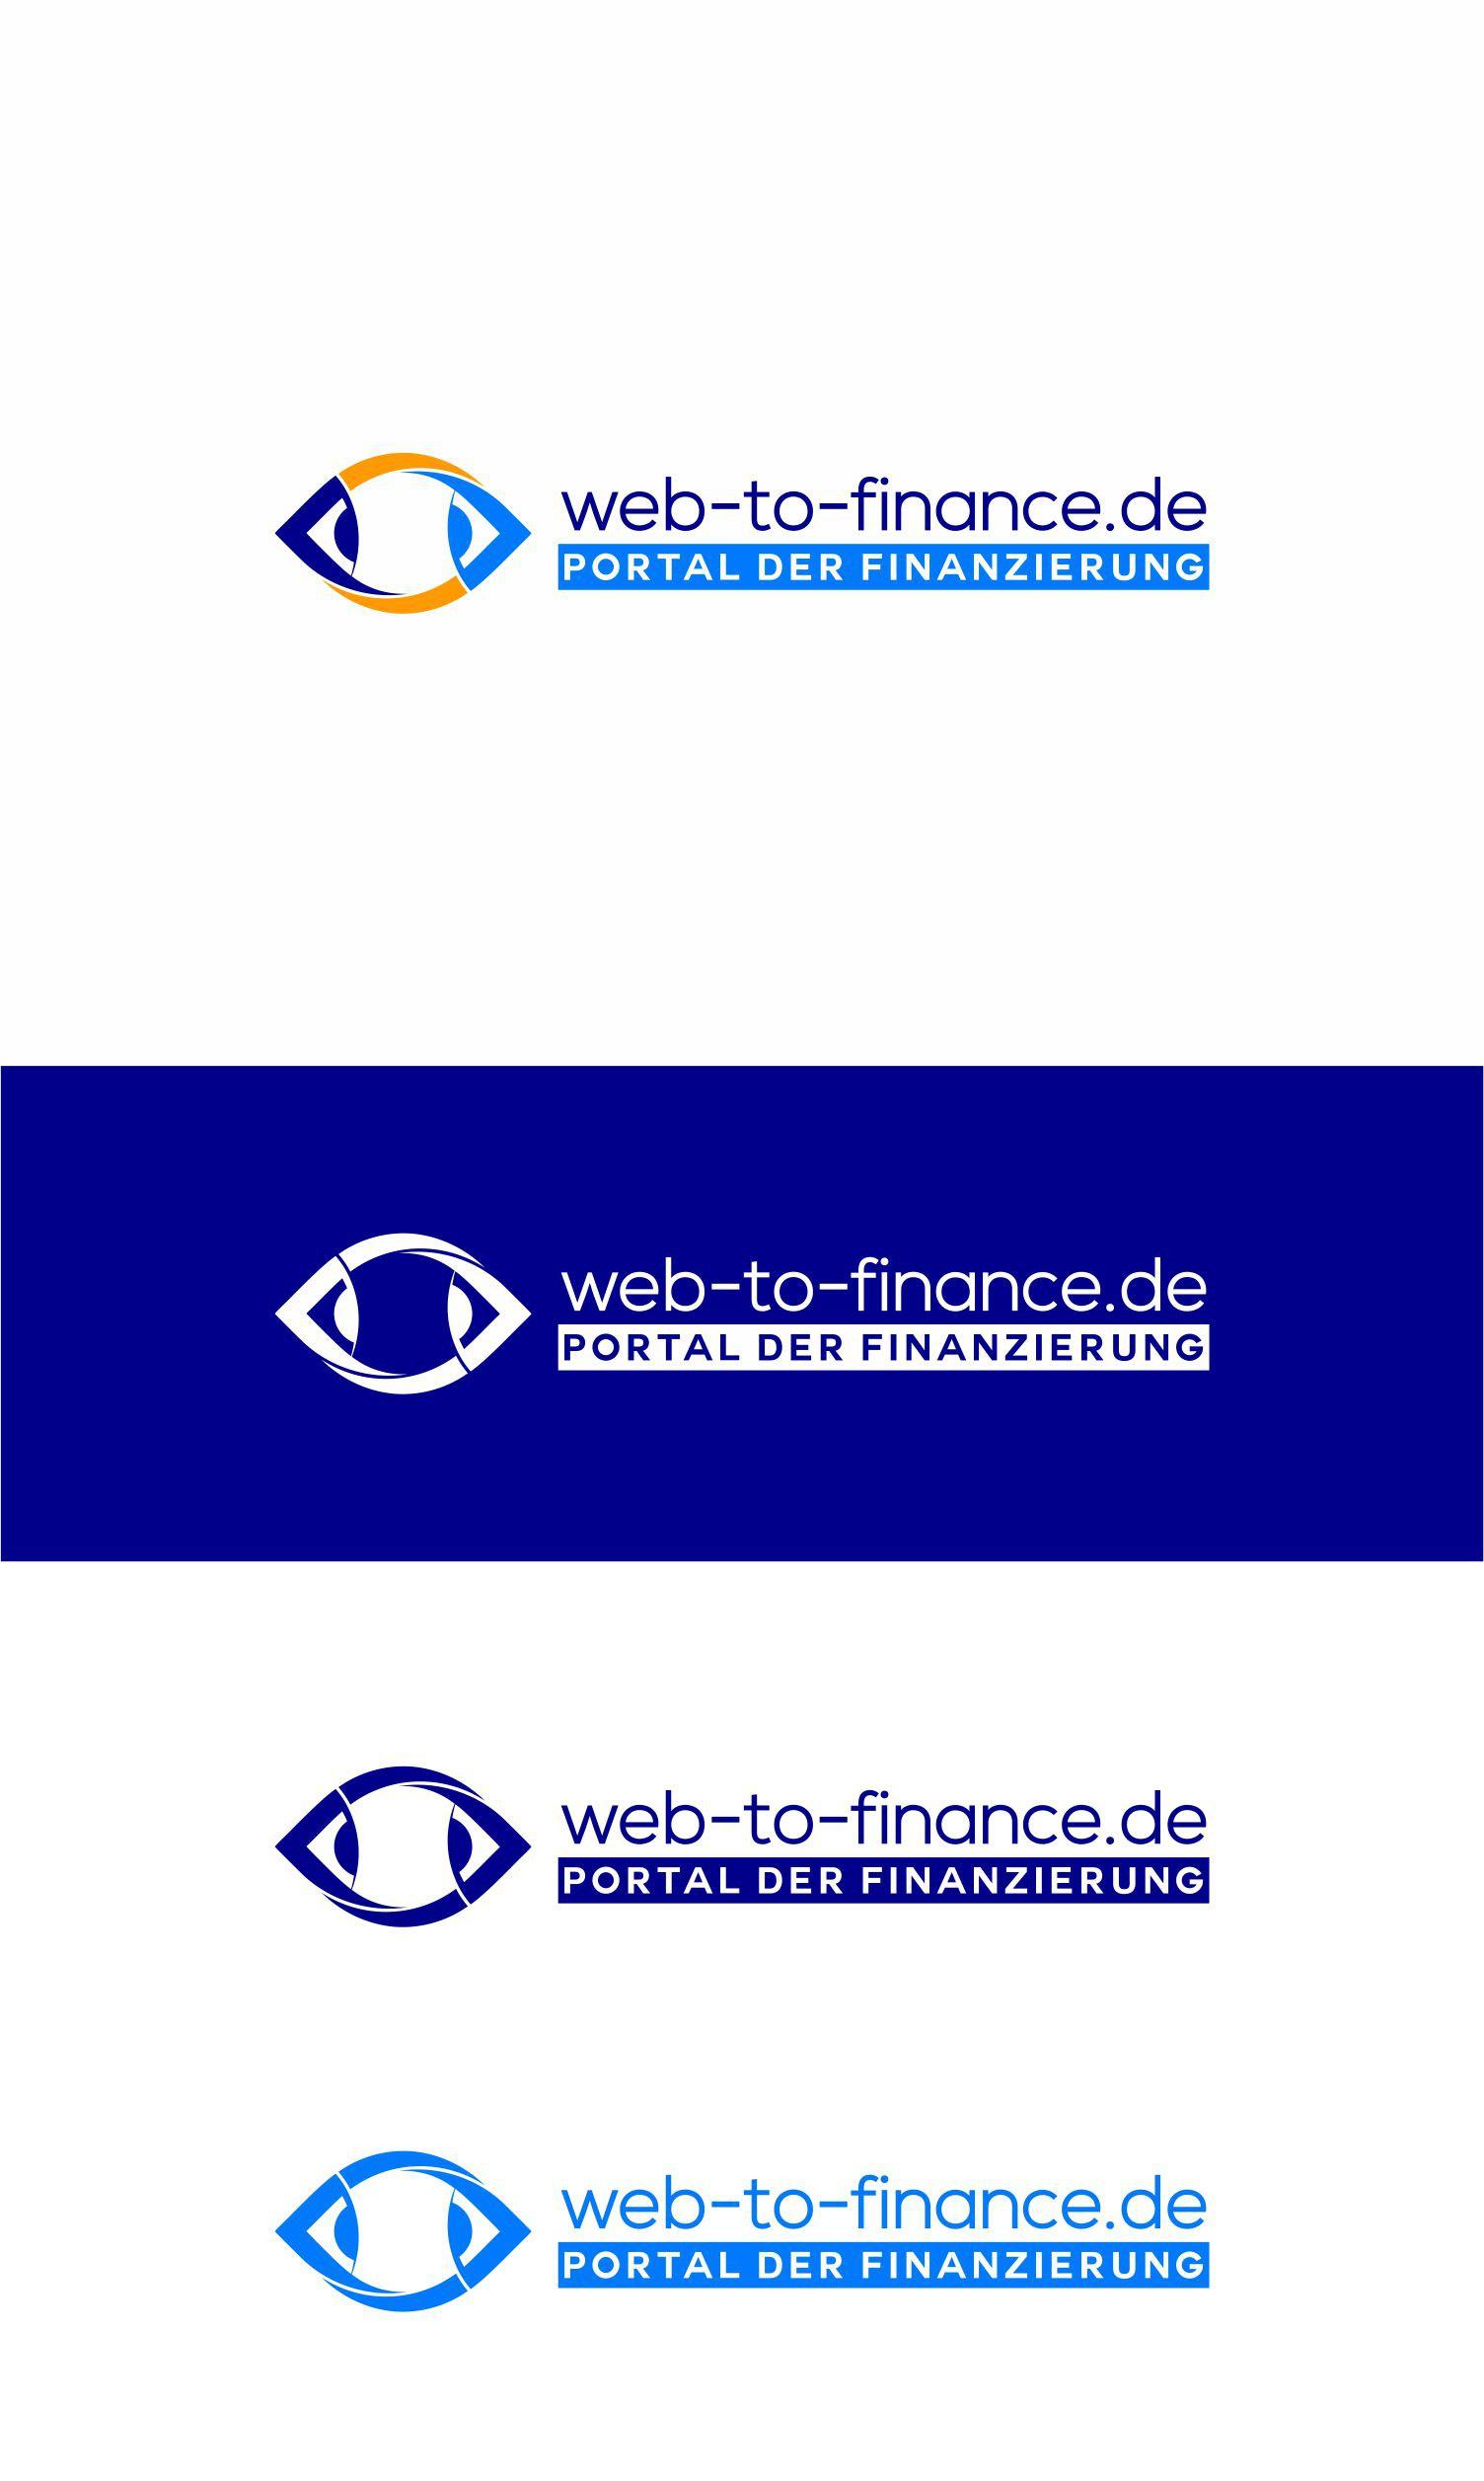 Create an impressive logo for the webportal web-to-finance.de